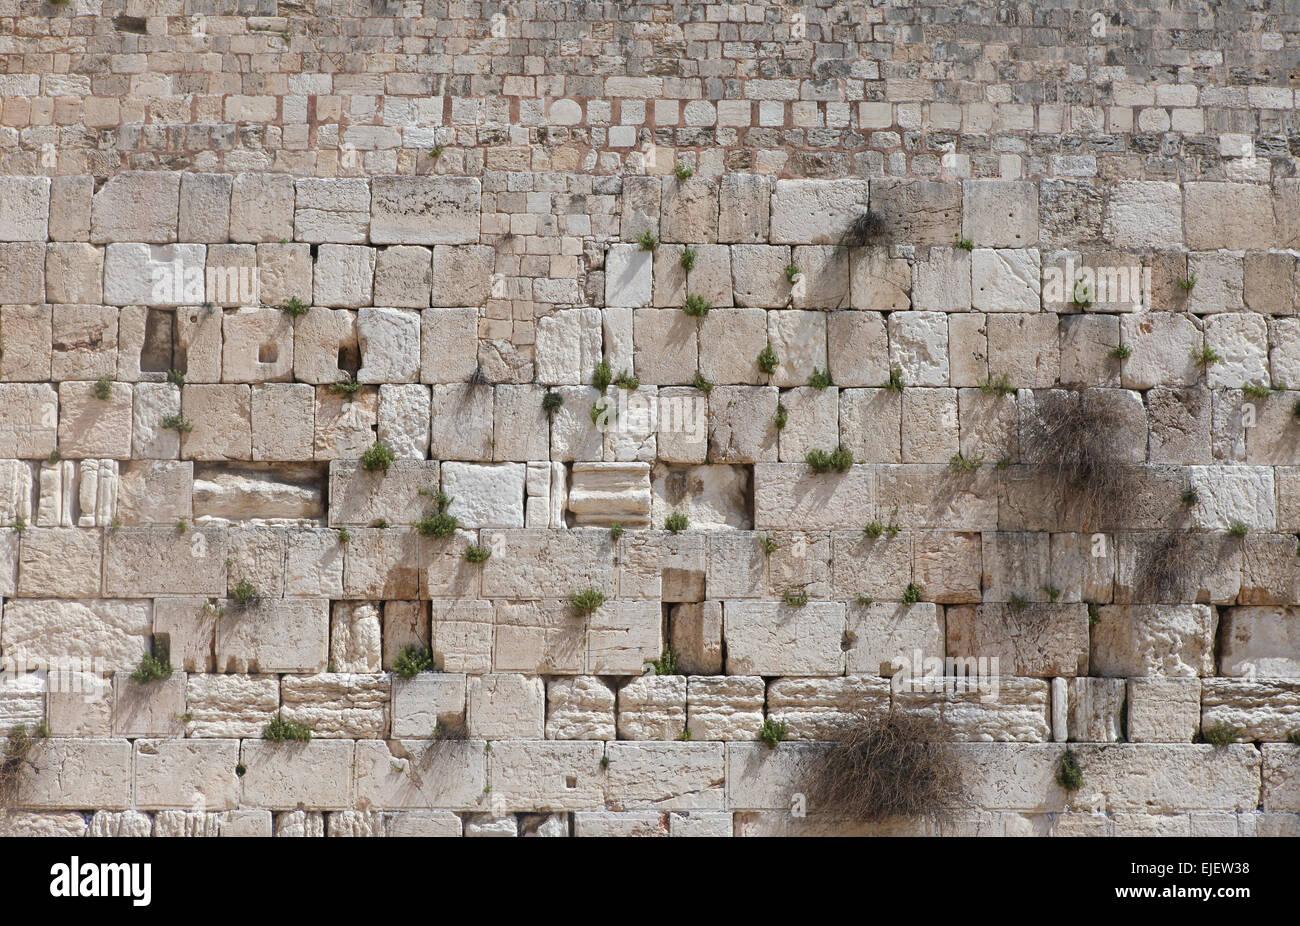 Stones of the Wailing wall, Jerusalem, Israel. - Stock Image